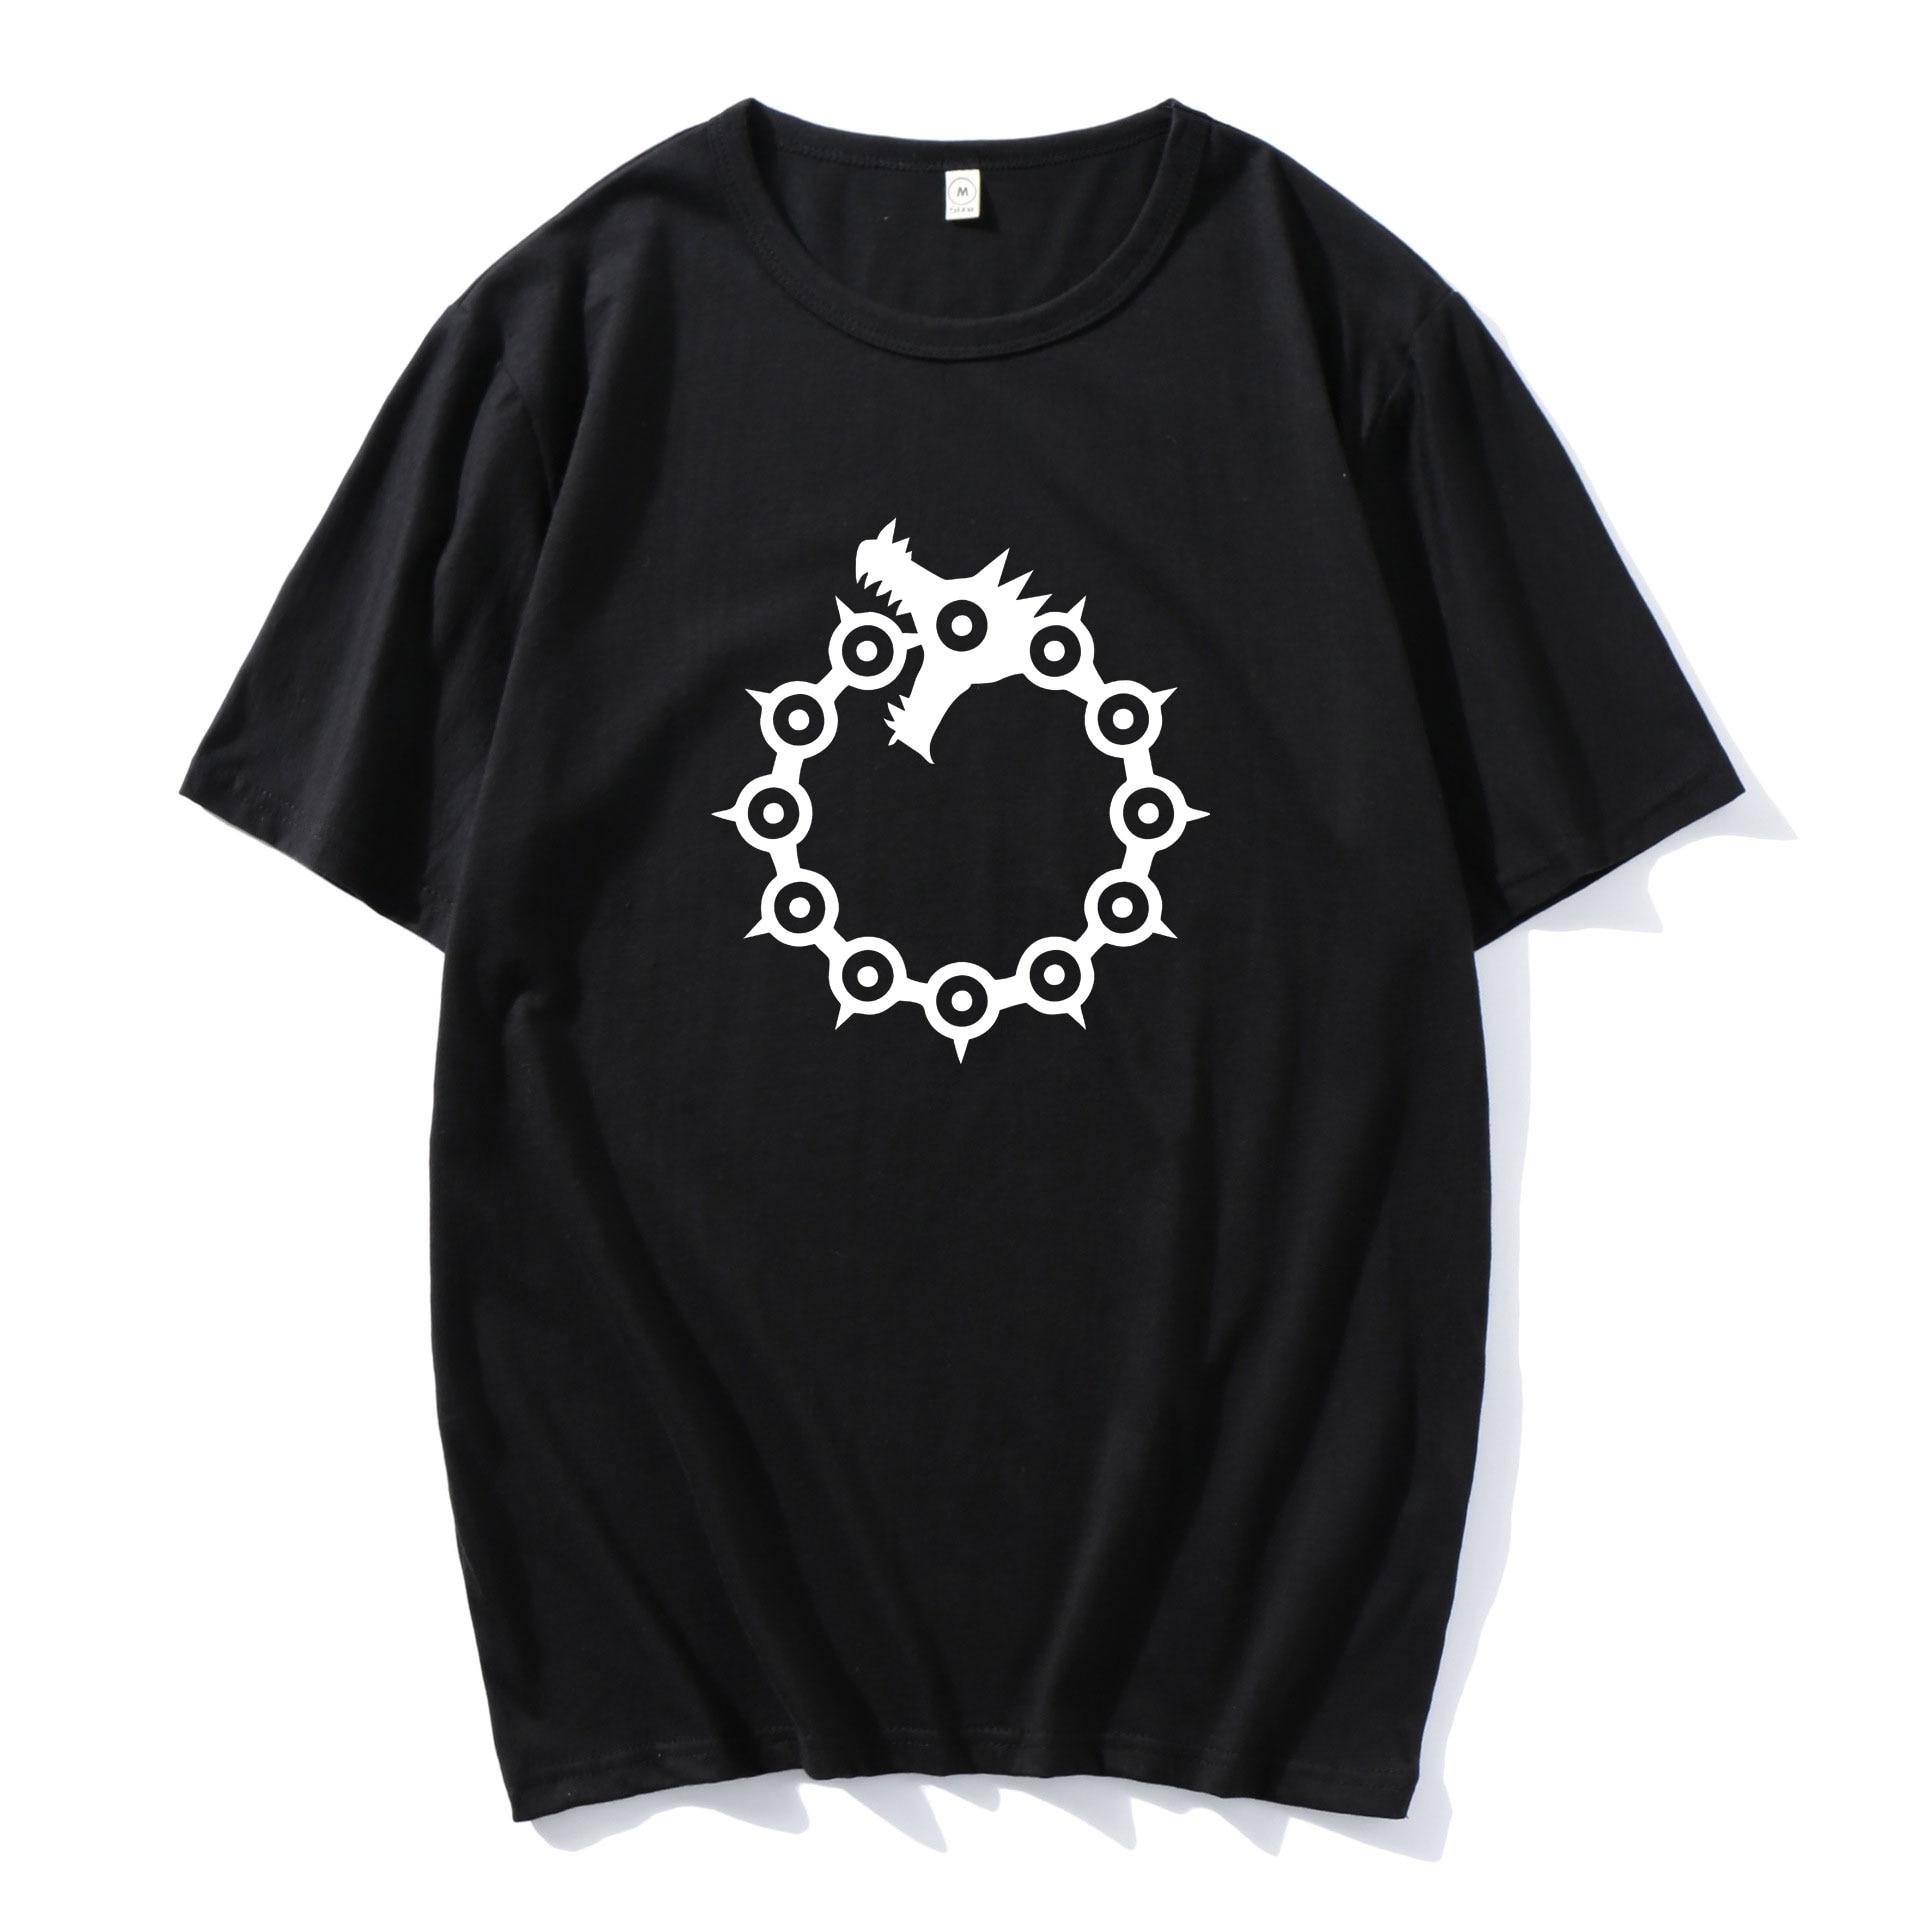 Nanatsu No Taizai Dragon's Sin of Wrath Men Women Fashion Hip Hop Loose T-Shirt Tops Anime 2021 The Seven Deadly Sins T Shirt neil t anderson the bondage breaker overcoming negative thoughts irrational feelings habitual sins unabridged